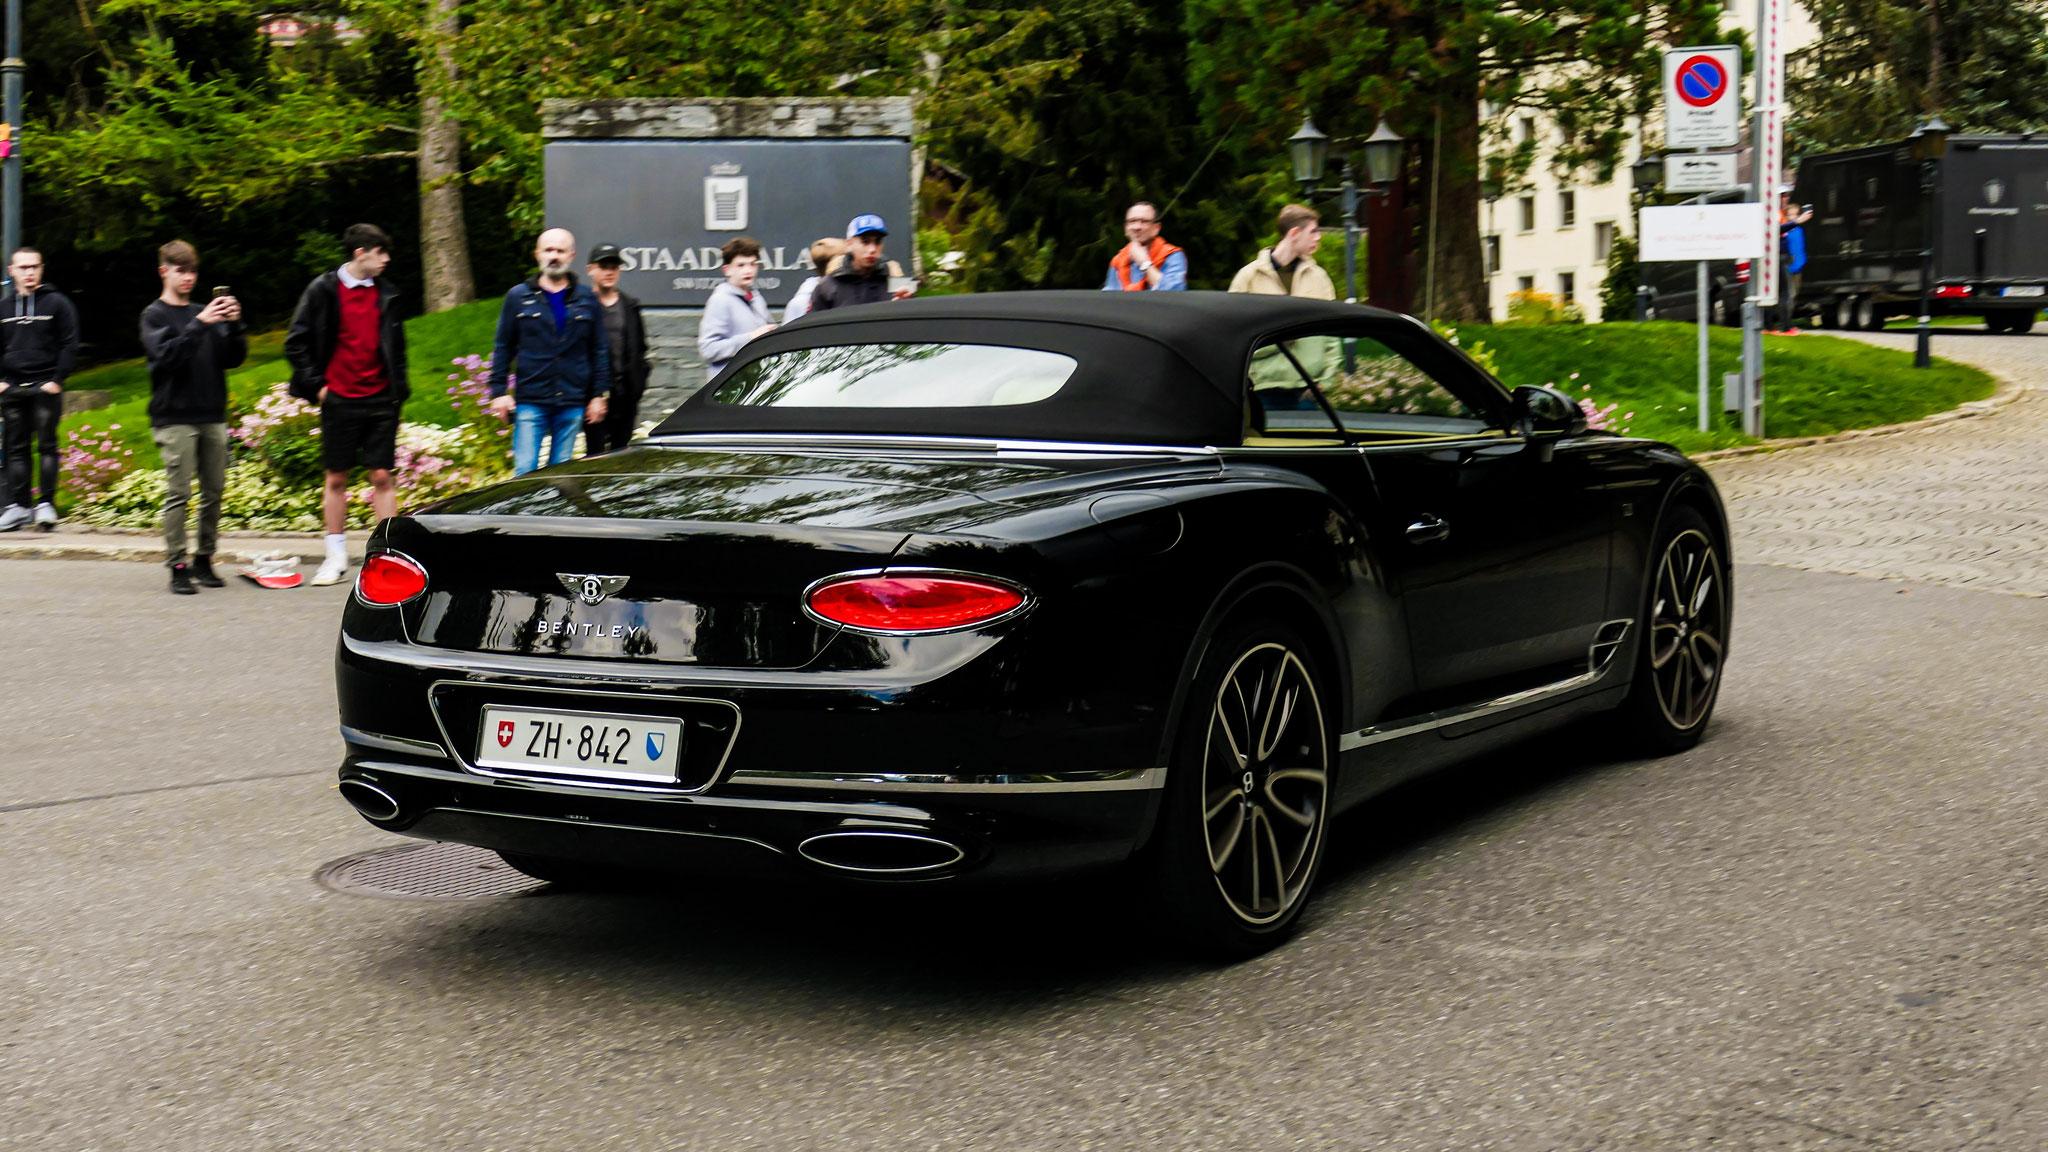 Bentley Continental GTC - ZH-842 (CH)